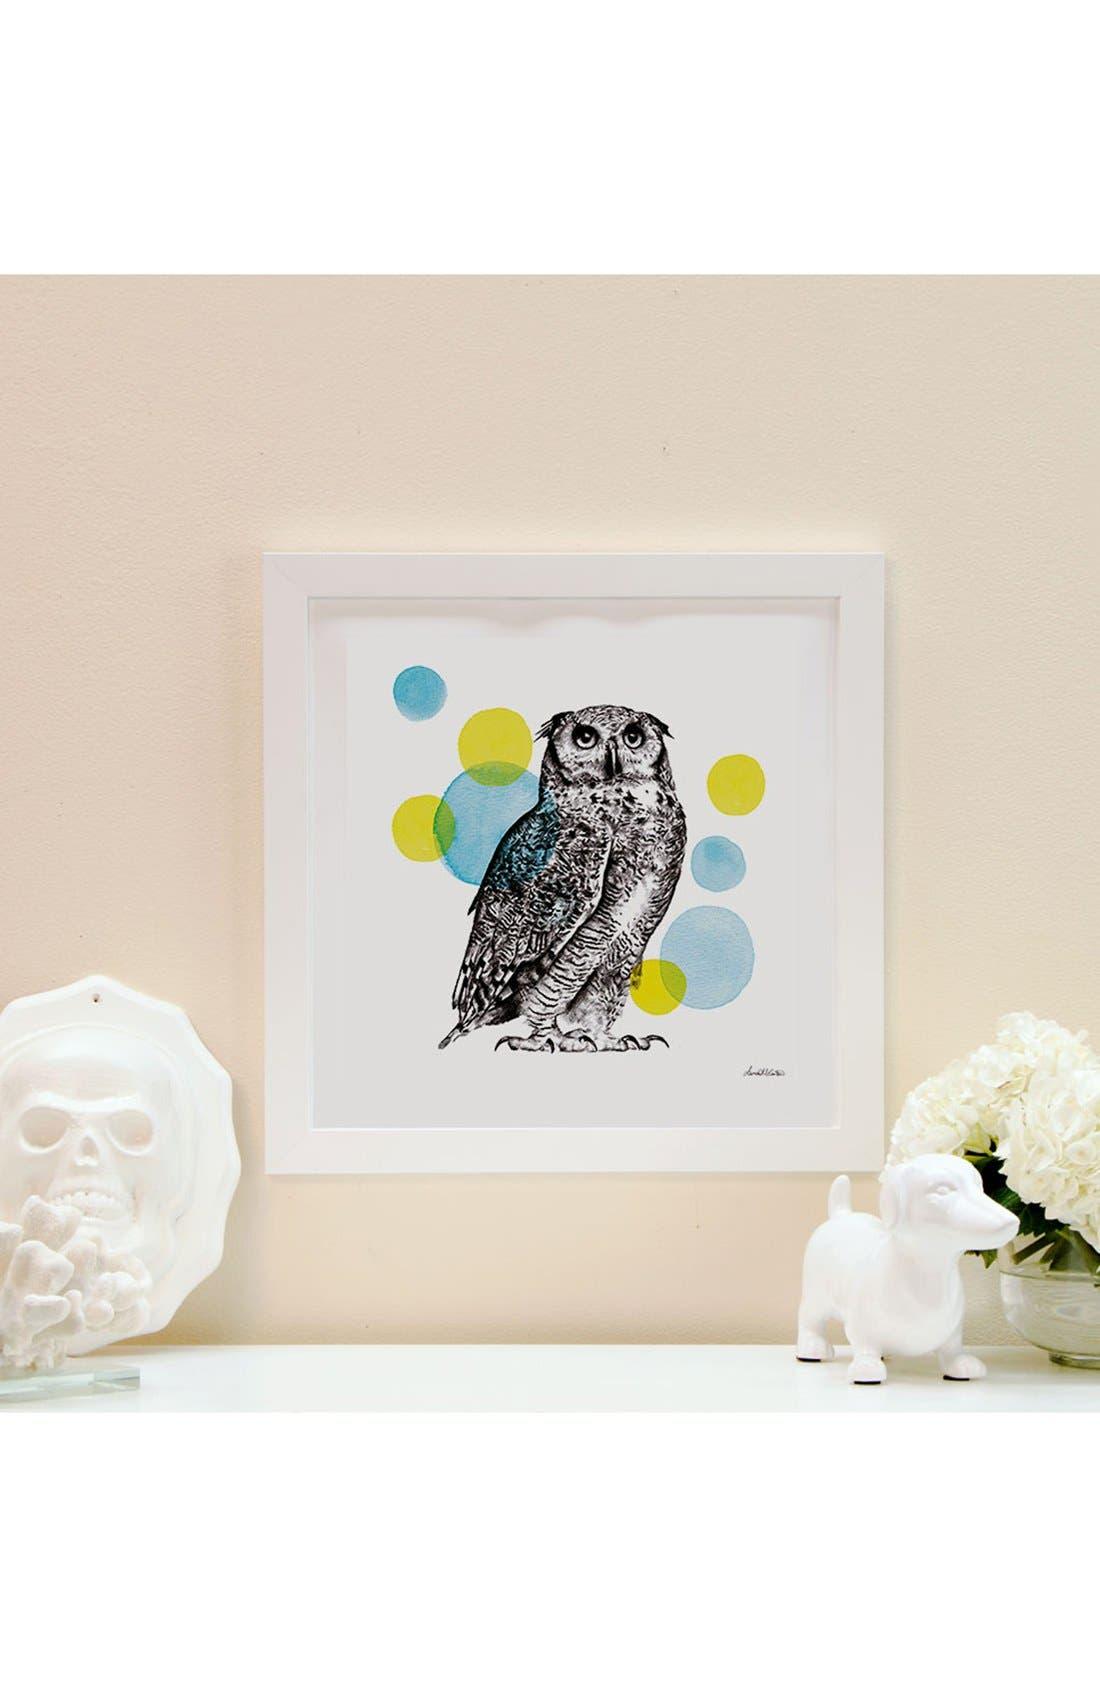 'Sketchbook - Owl' Giclée Print Framed Canvas Art,                             Alternate thumbnail 2, color,                             White